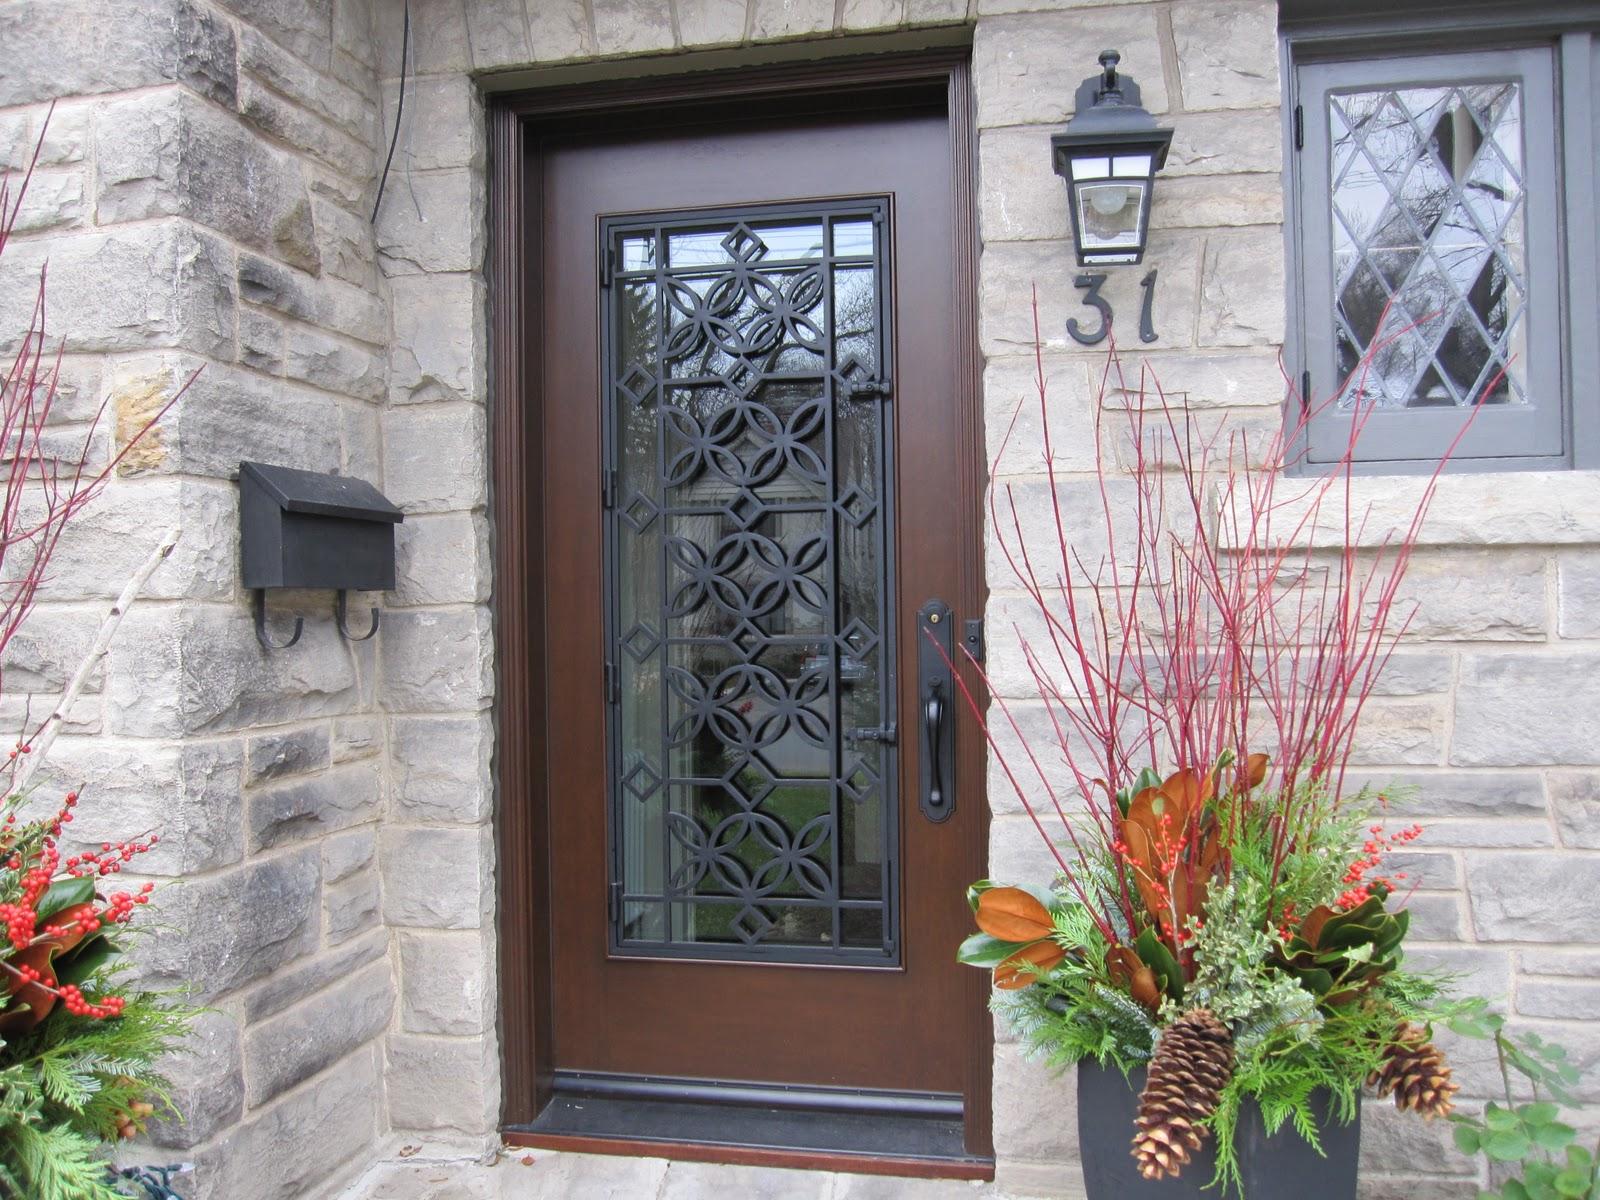 1200 #737842 A5037 Custom Fiberglass Door With Custom Grille Pattern save image Custom Fiberglass Doors 45971600